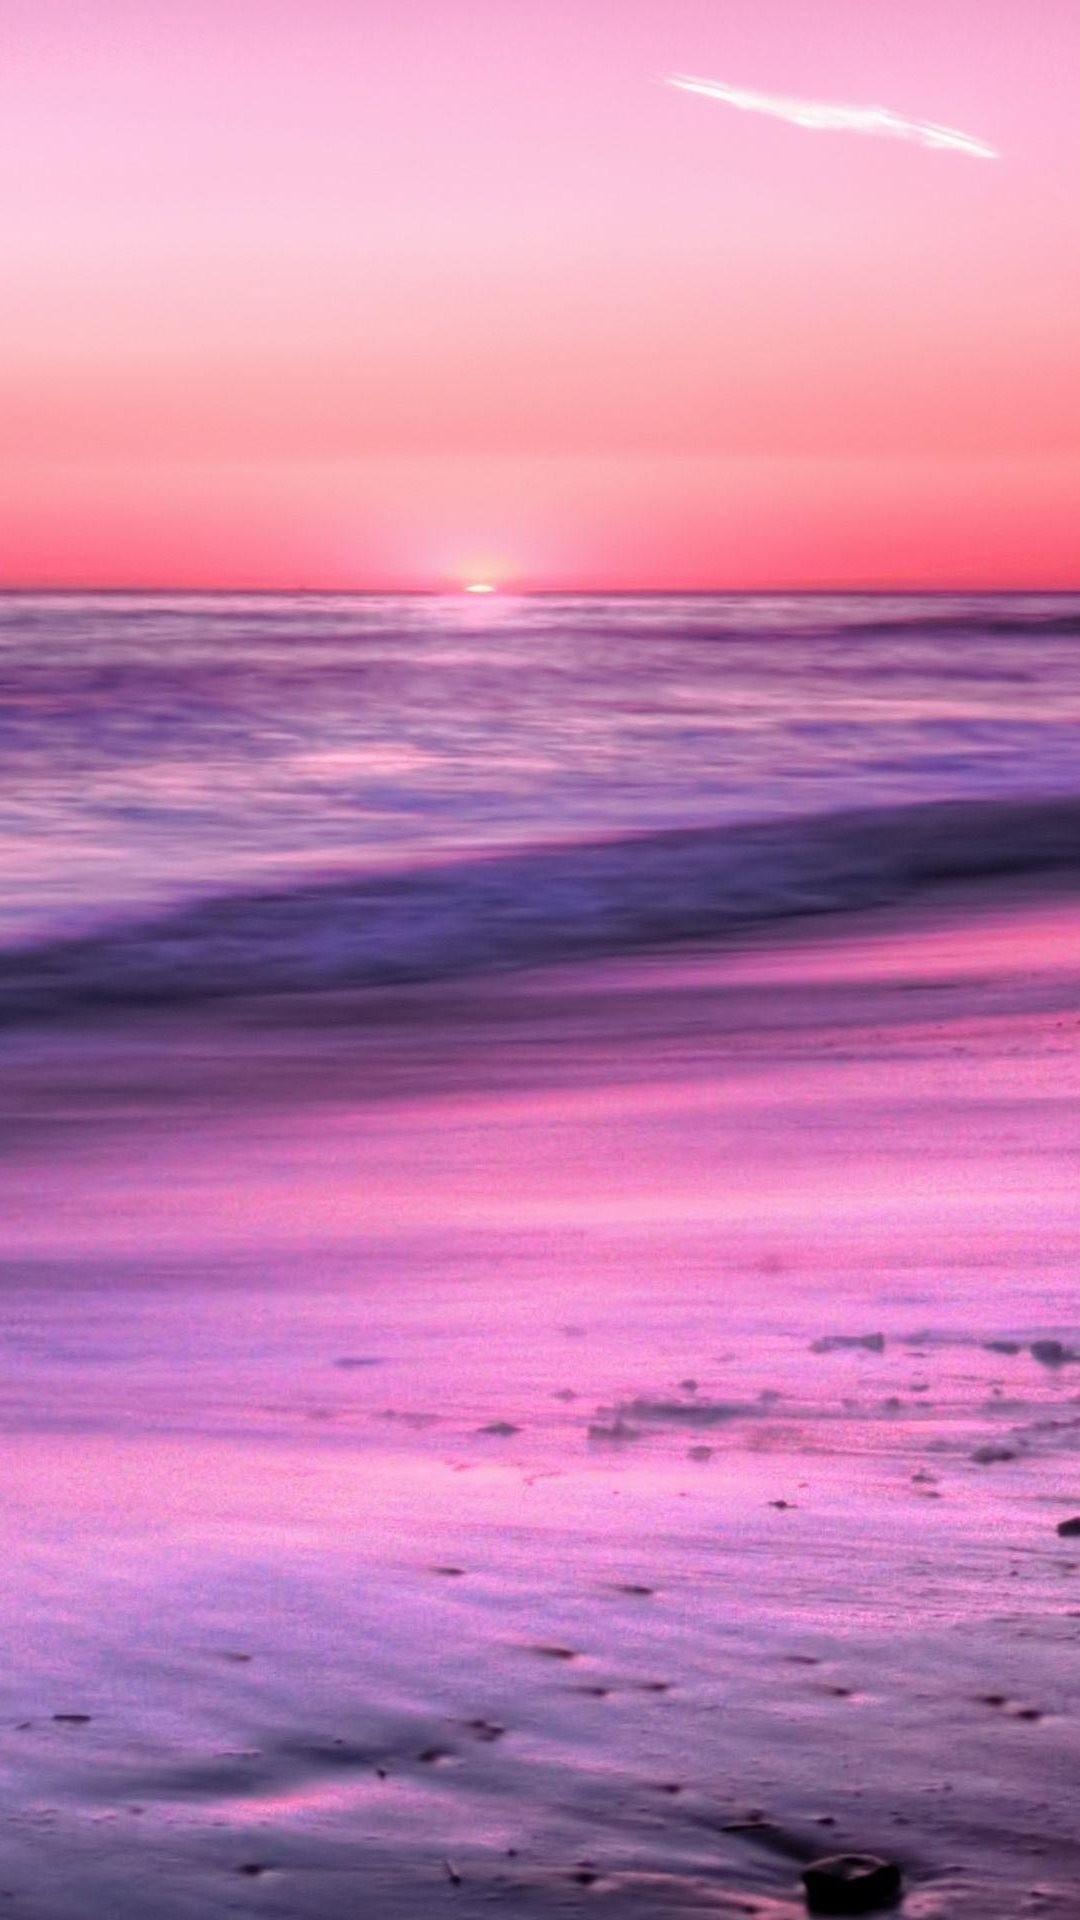 Nature iPhone 6 Plus Wallpapers – Sunrise Horizon Calm Sea Beach iPhone 6  Plus HD Wallpaper